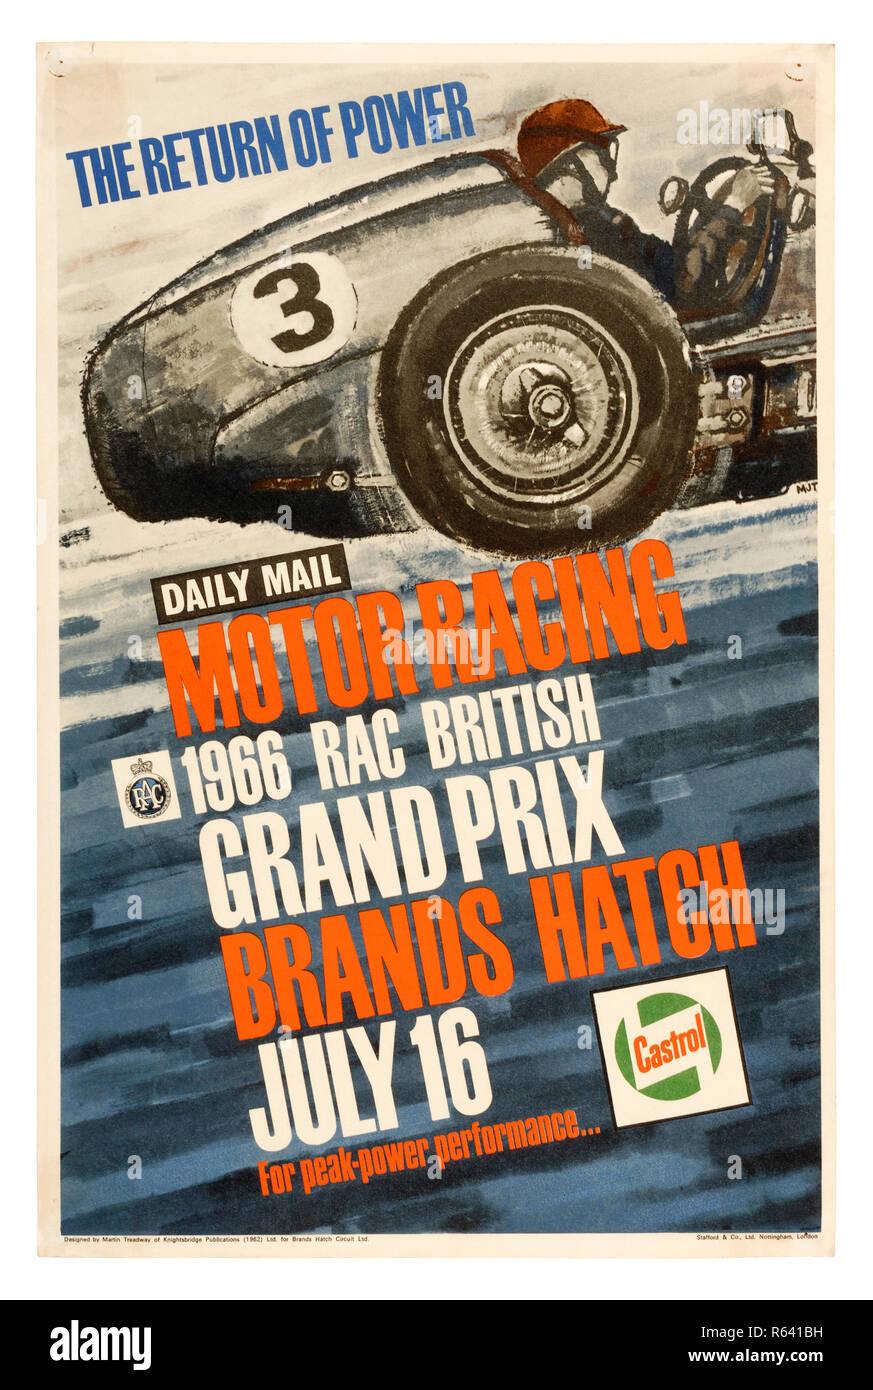 Vintage poster for the 1966 RAC British Grand Prix Formula 1 race at Brands Hatch - Stock Image